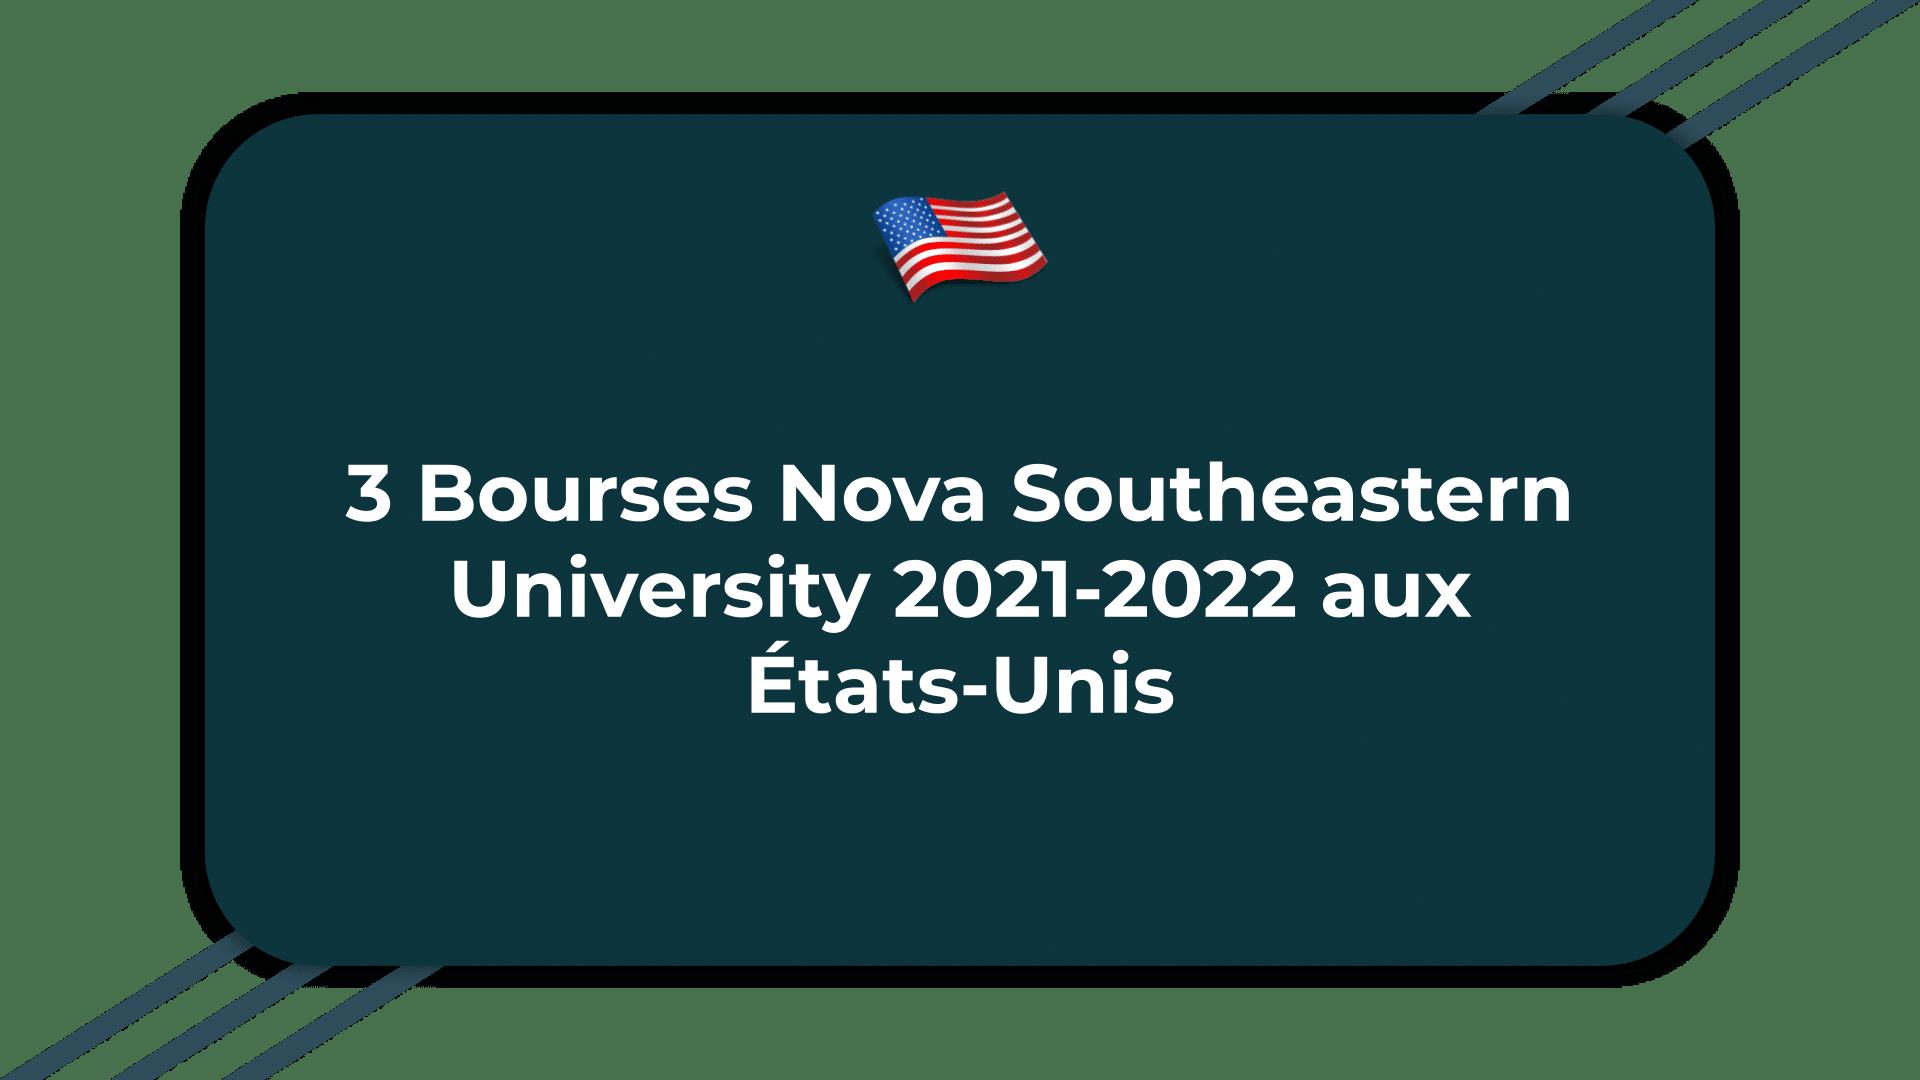 Bourses Nova Southeastern University